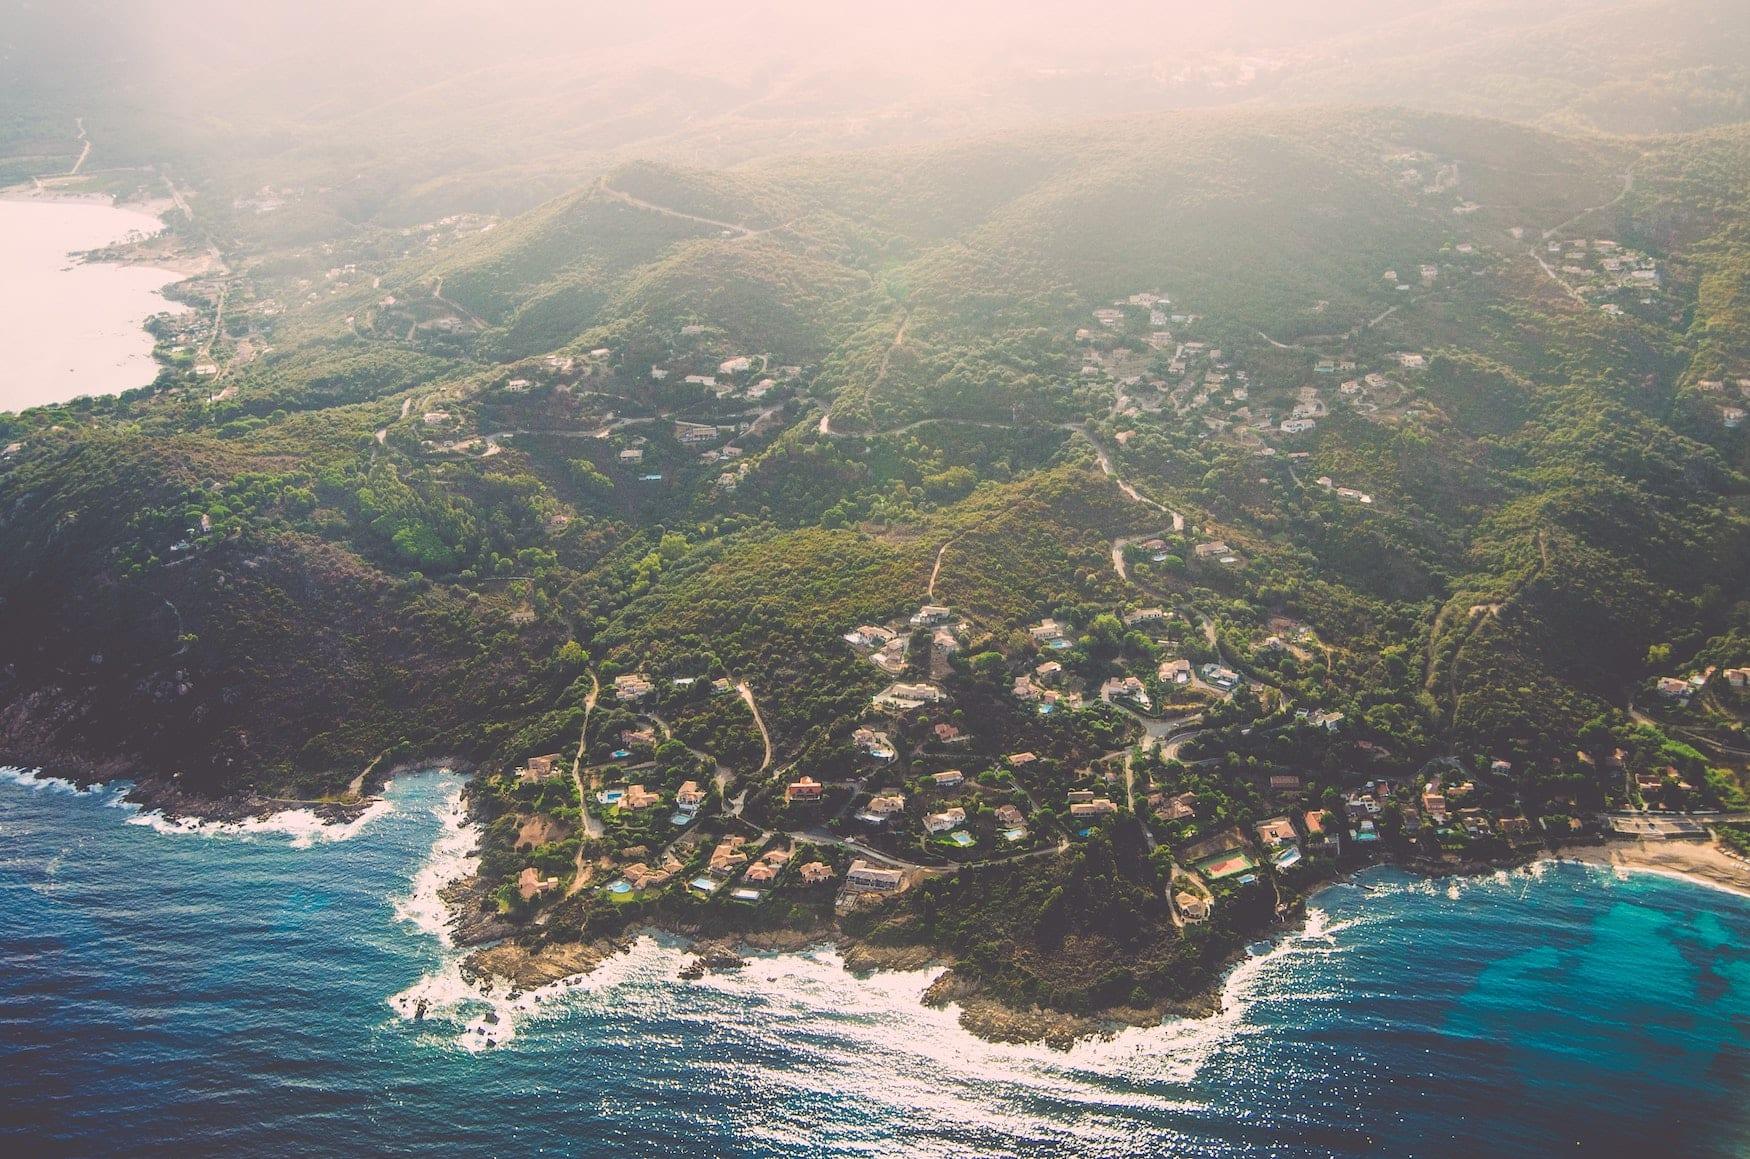 Anflug auf Korsika